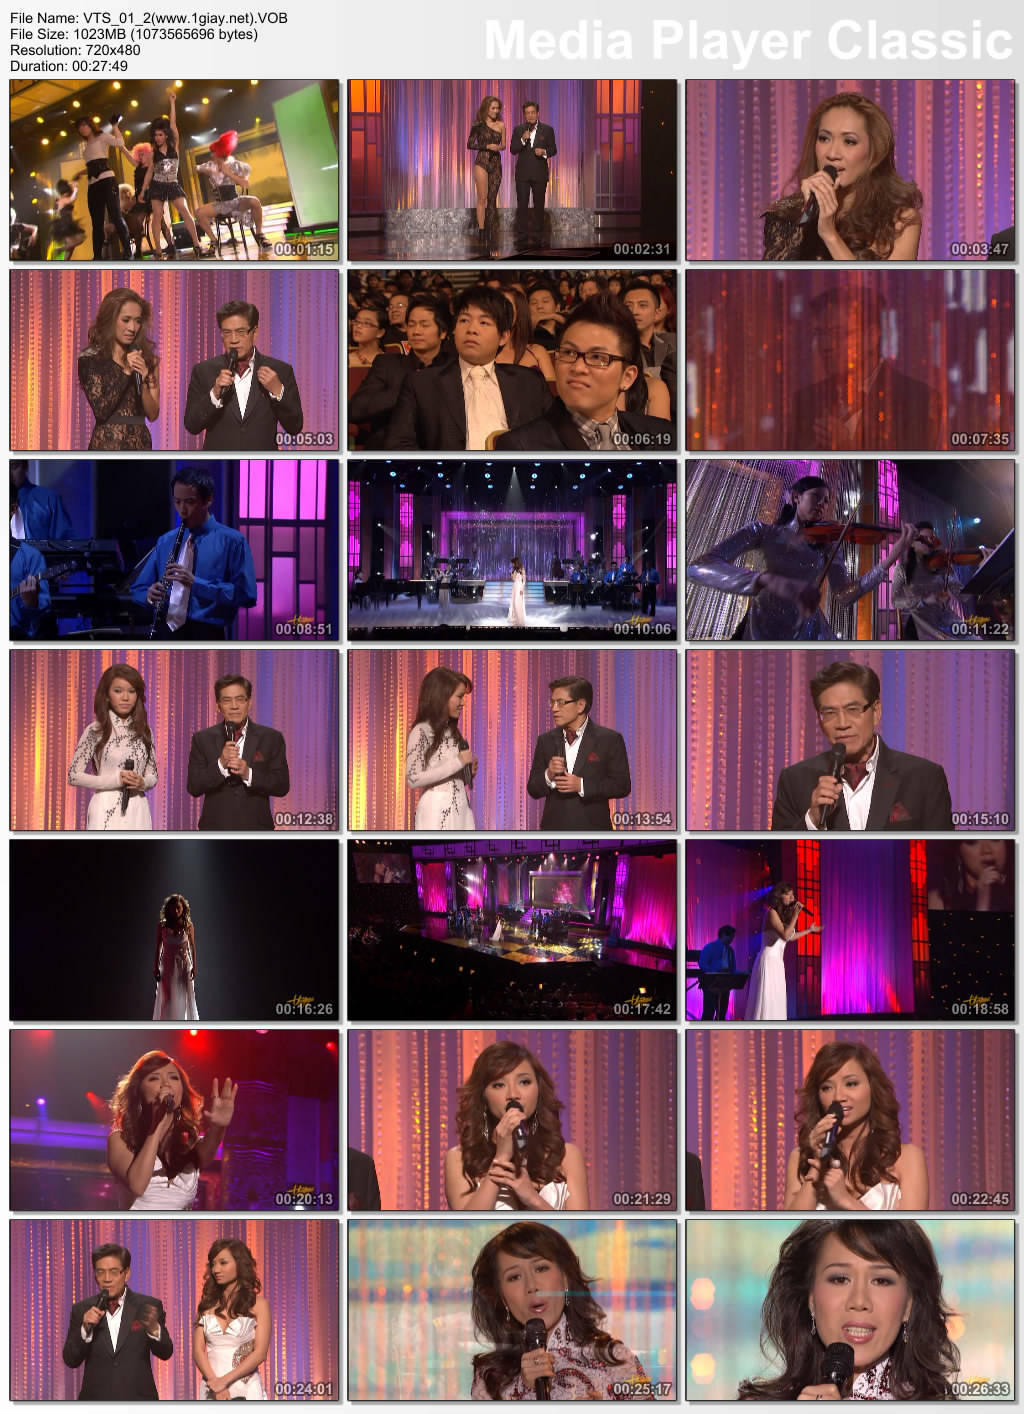 Paris by night divas hot hottttttttttttt trọn bộ DVD5 link MF  - Page 2 5610155eaa275b812425404e1b16a5831b9fcf1